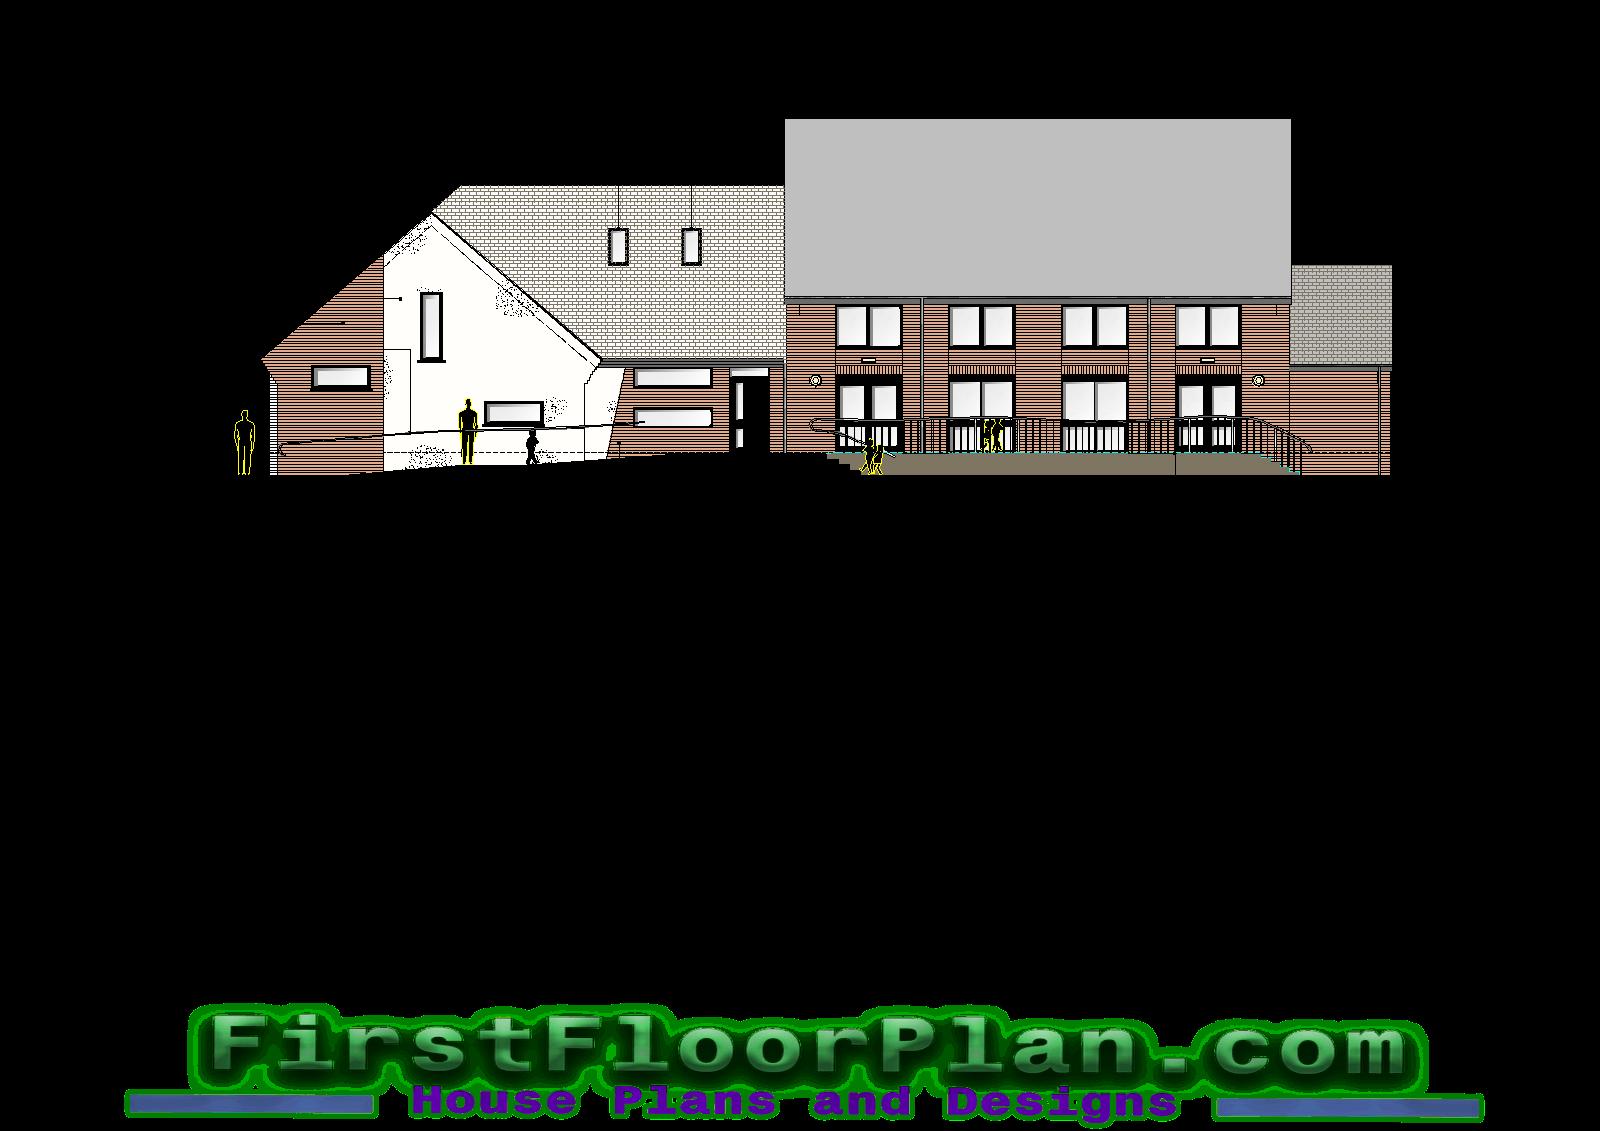 Architecture Design of House AutoCAD File